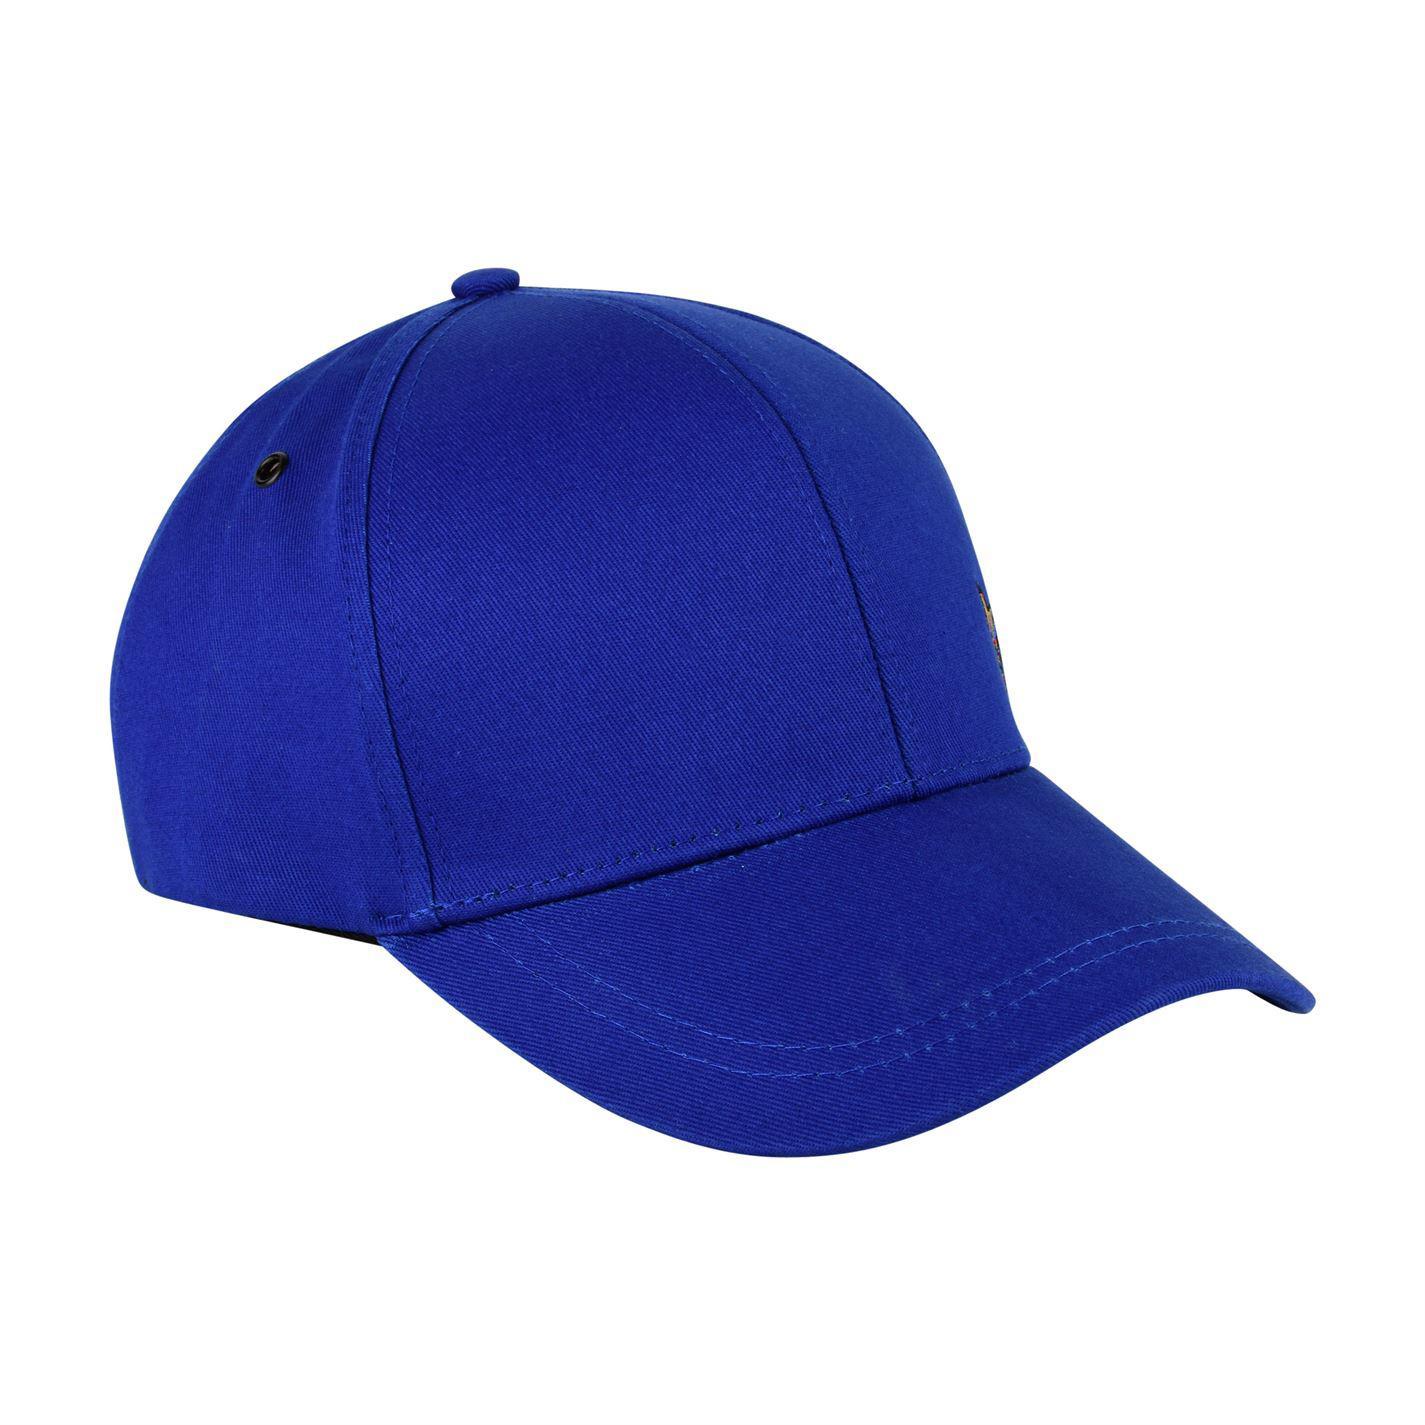 19ff982450e Lyst - Paul Smith Zebra Logo Cap in Blue for Men